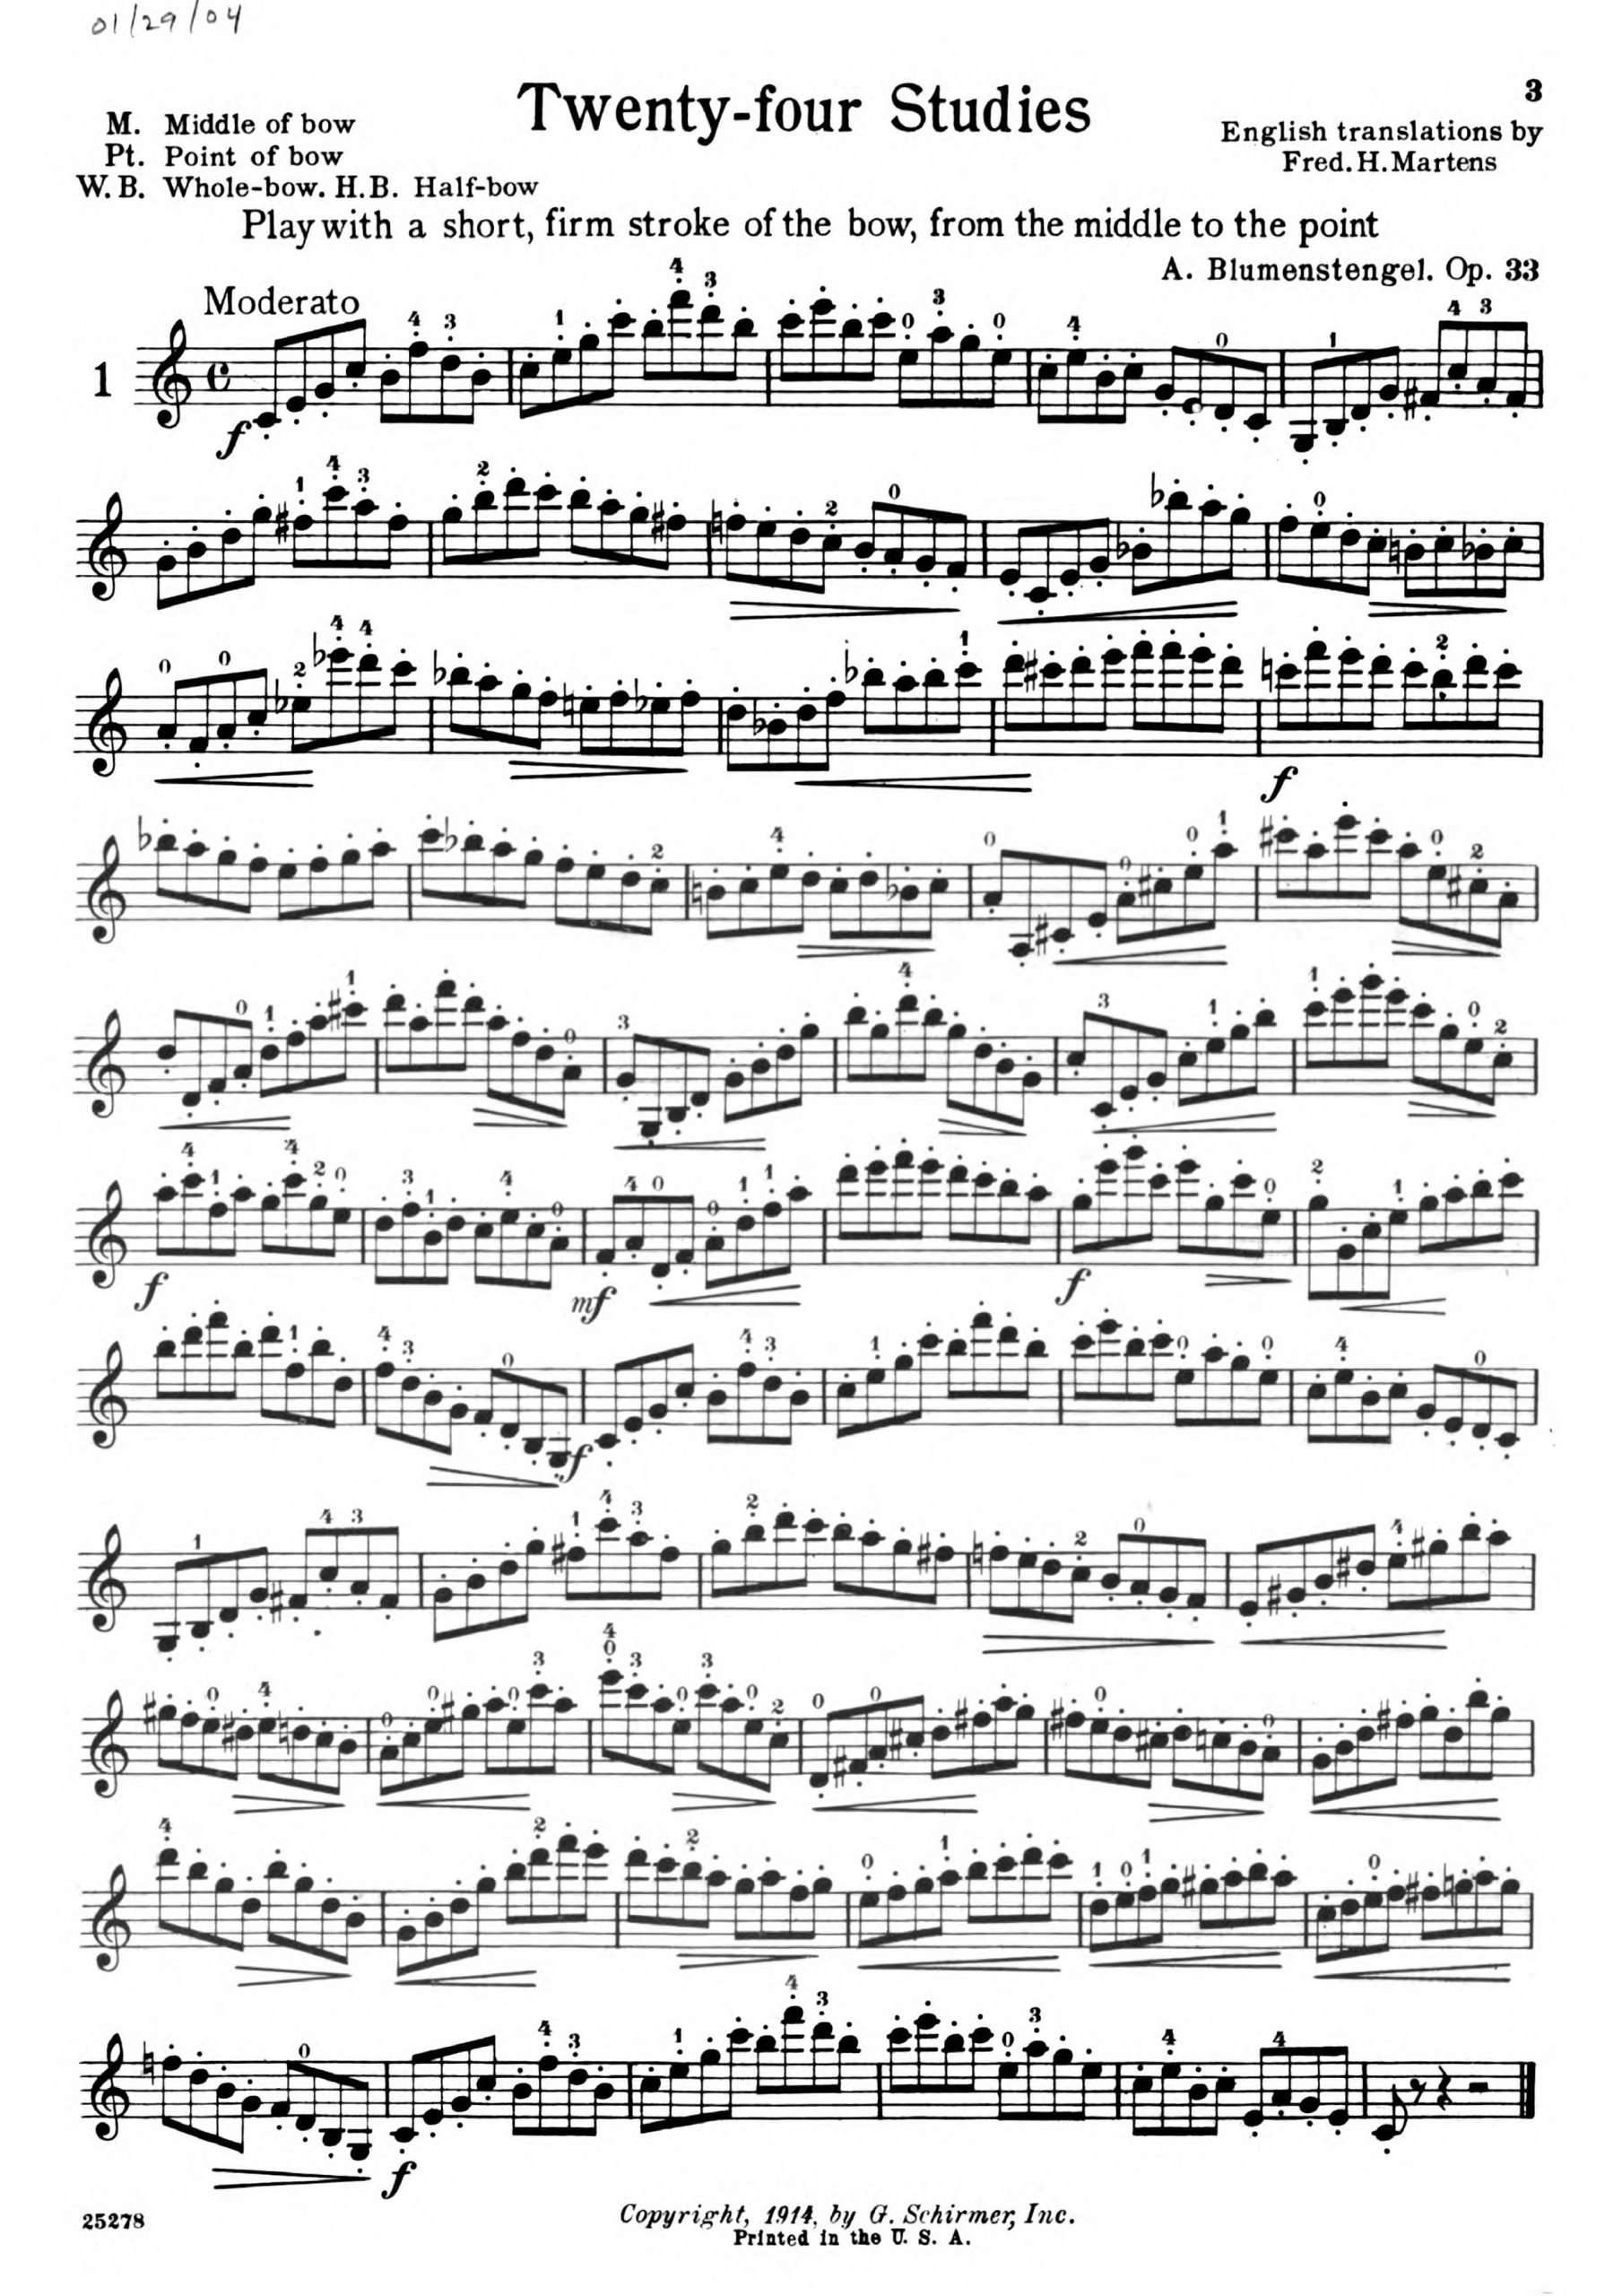 Blumenstengel, Albrecht - 24 Violin Etudes, Op.33